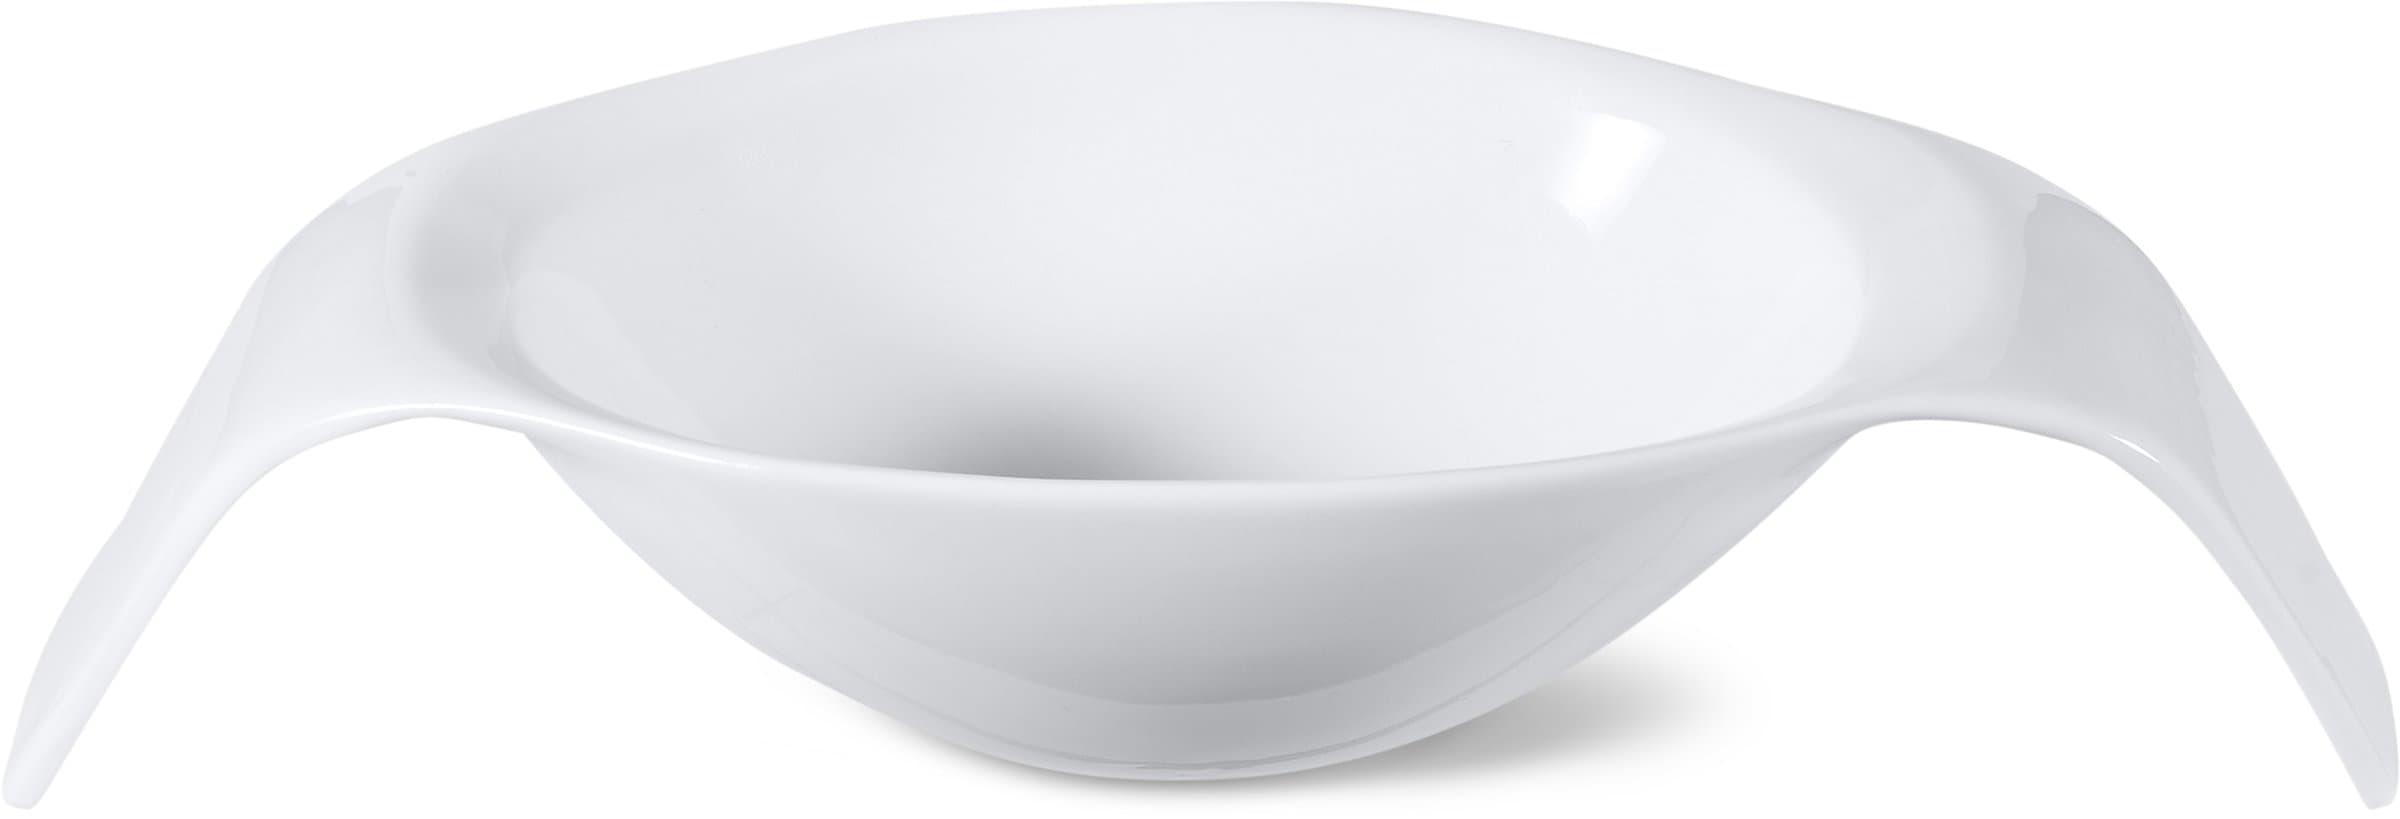 Cucina & Tavola CUCINA & TAVOLA Bowl mit Doppelfuss